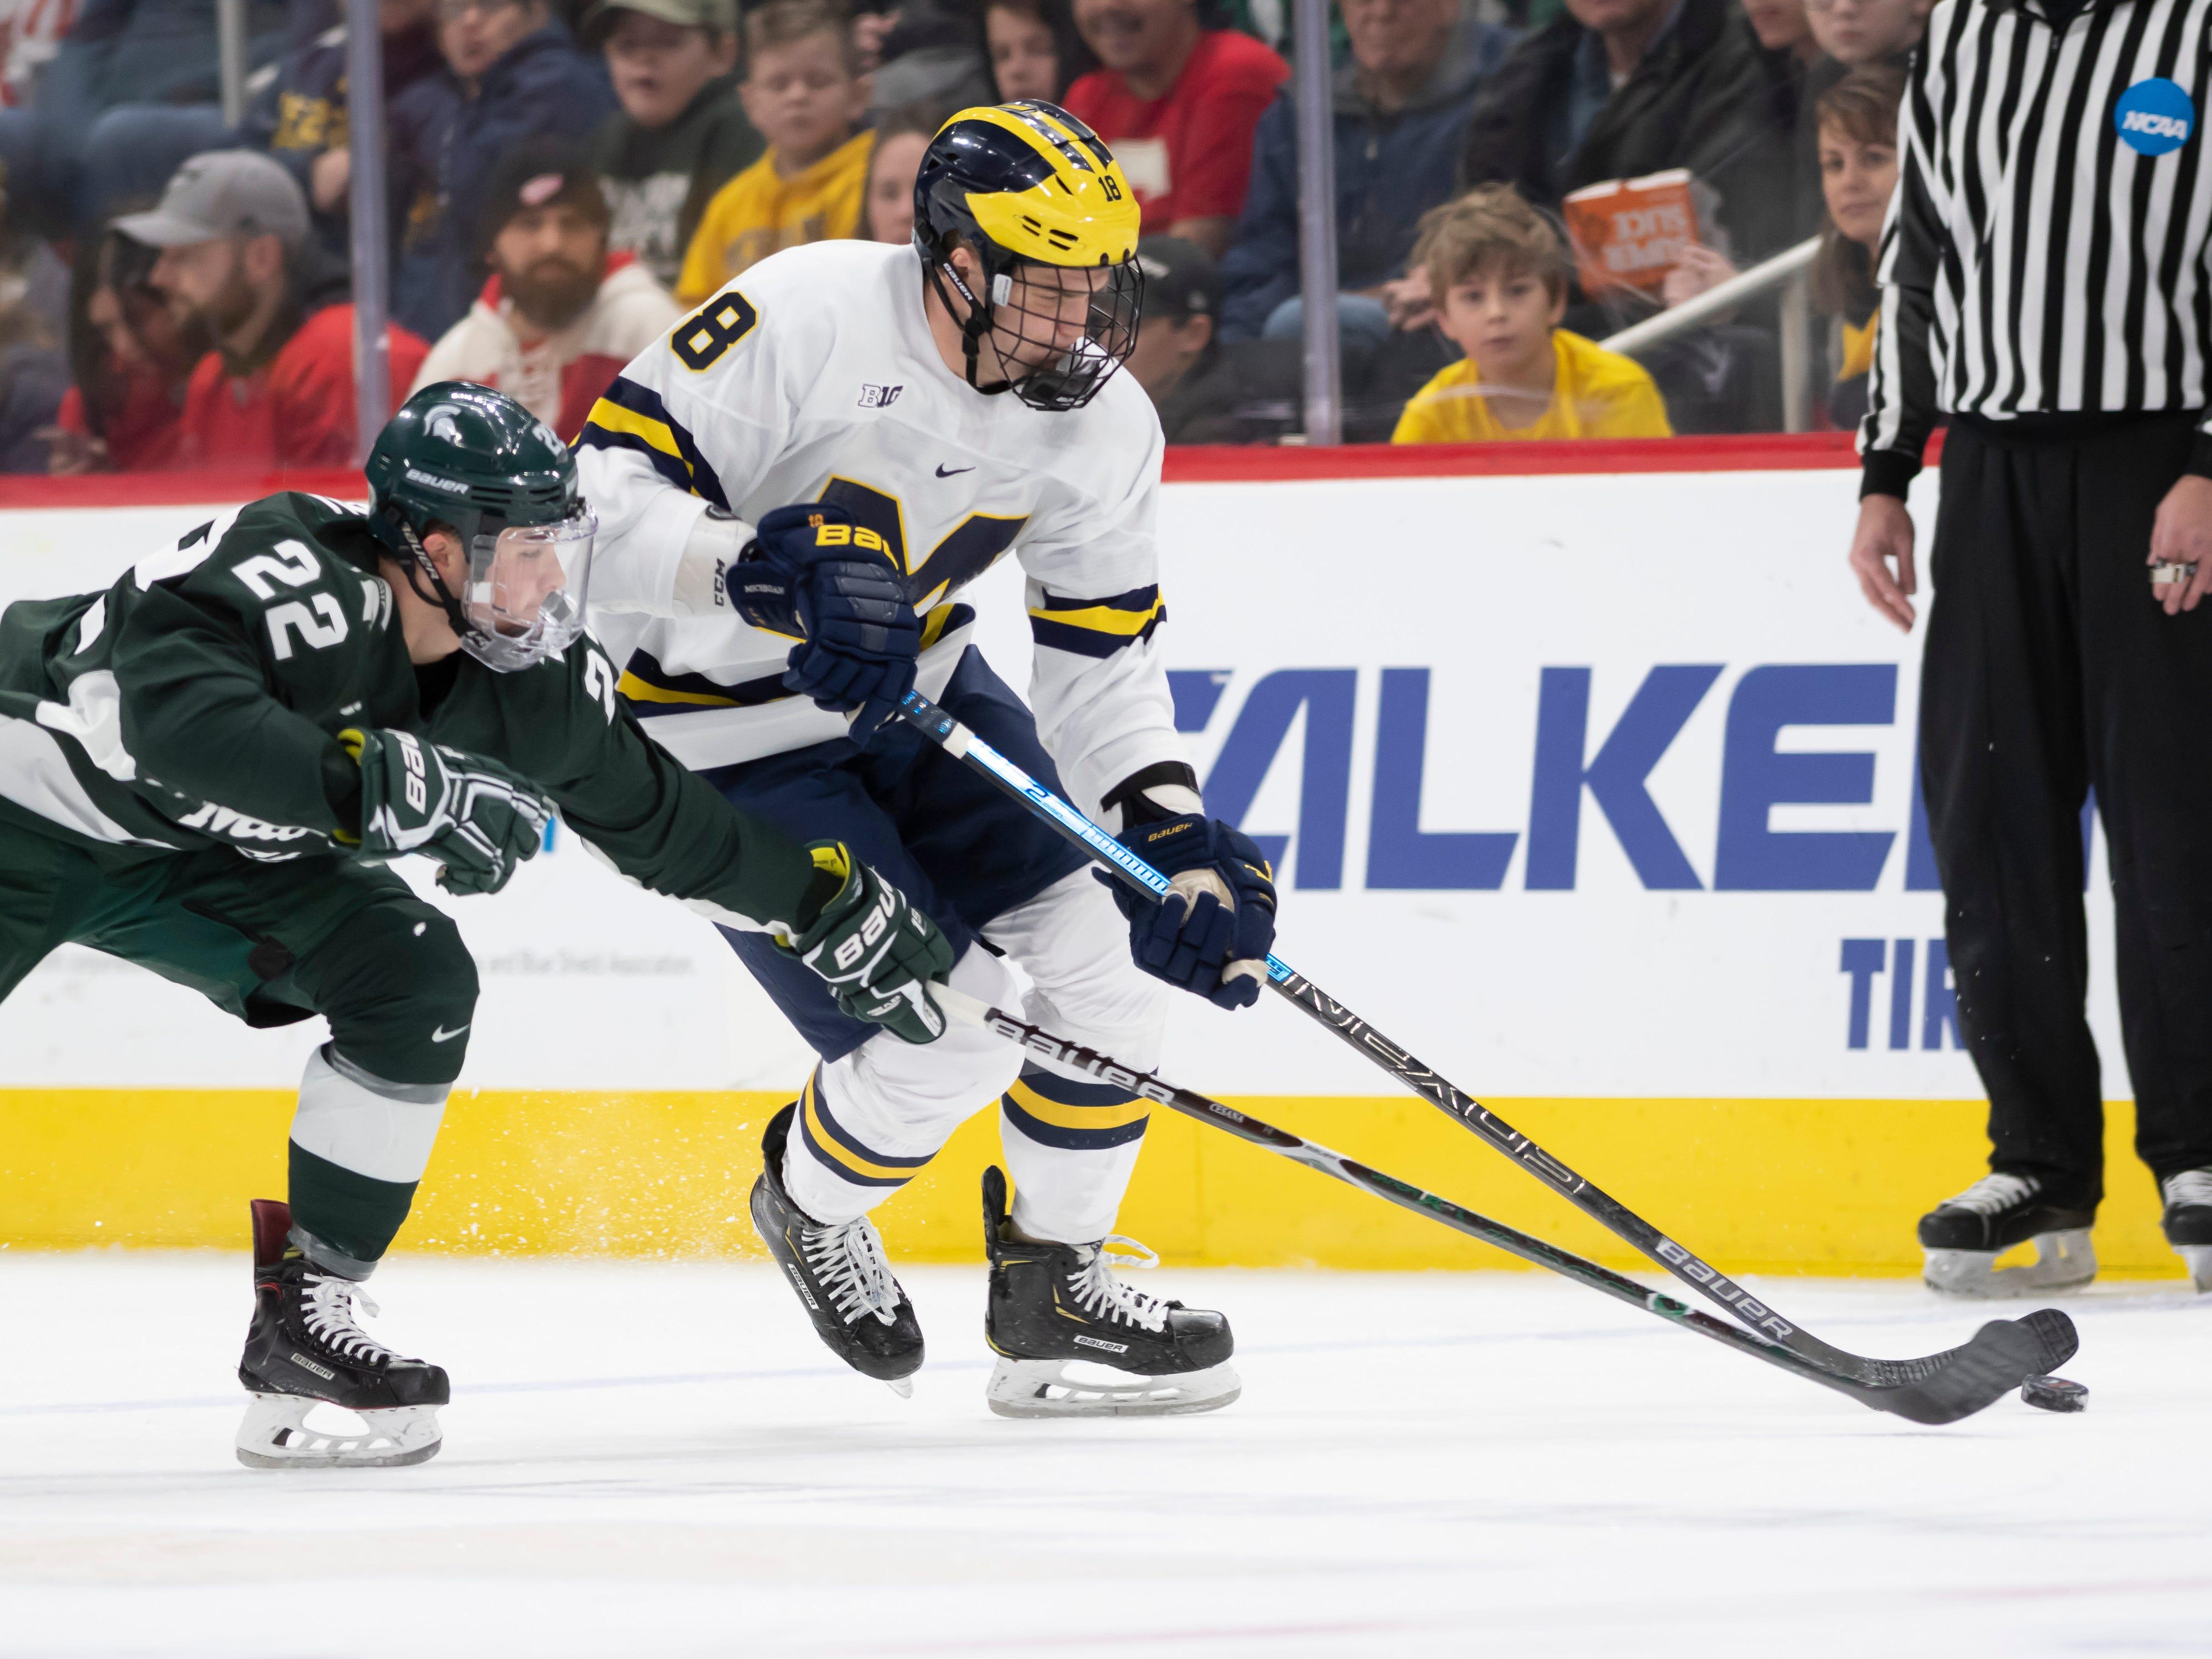 Michigan State defenseman Dennis Cesana and Michigan forward Adam Winborg battle for the puck in the first period.